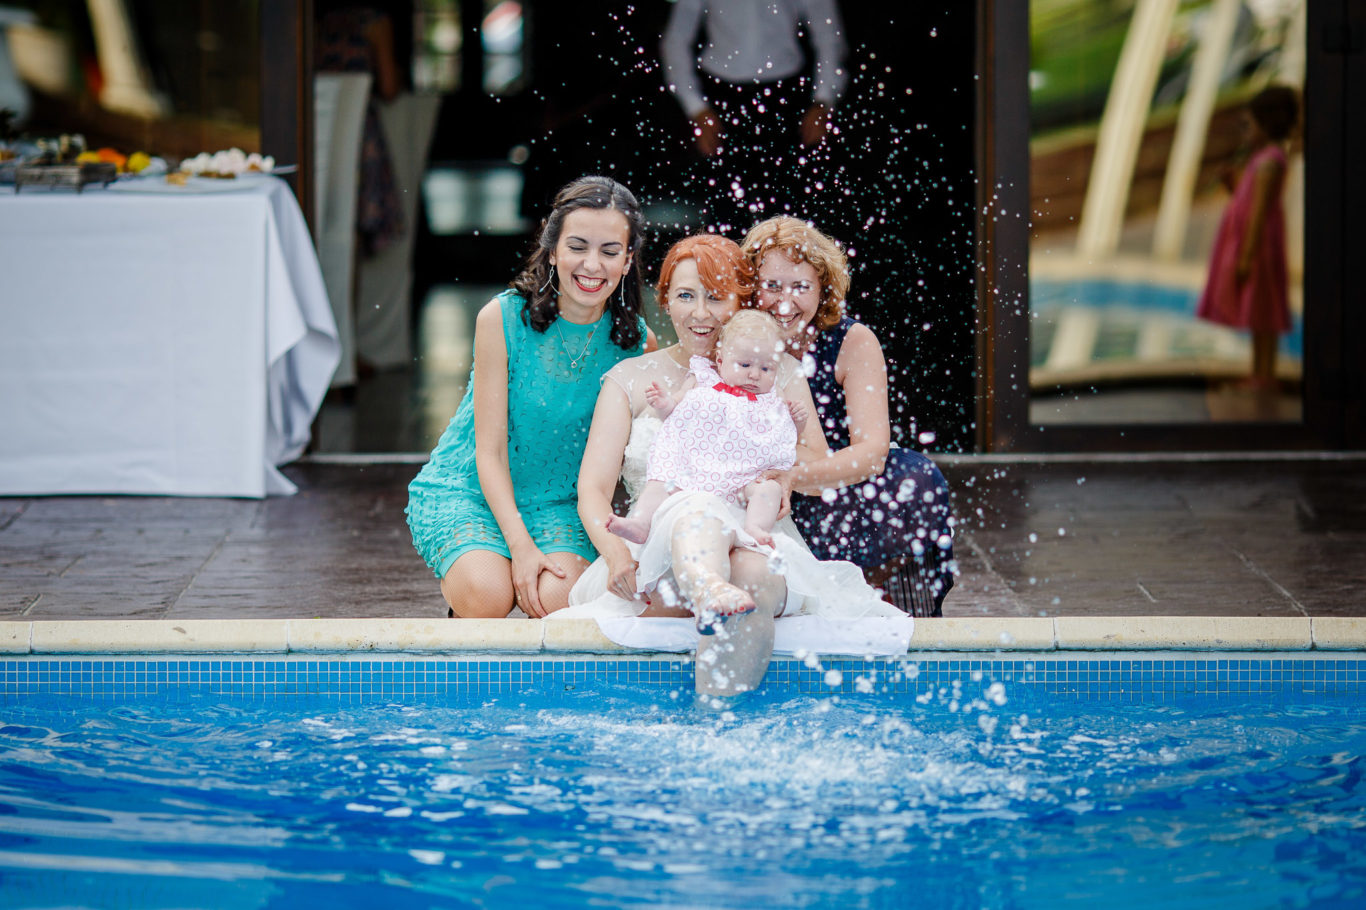 0459-Fotografie-nunta-botez-Ingrid-Geta-Mihai-fotograf-Ciprian-Dumitrescu-IMG_2049